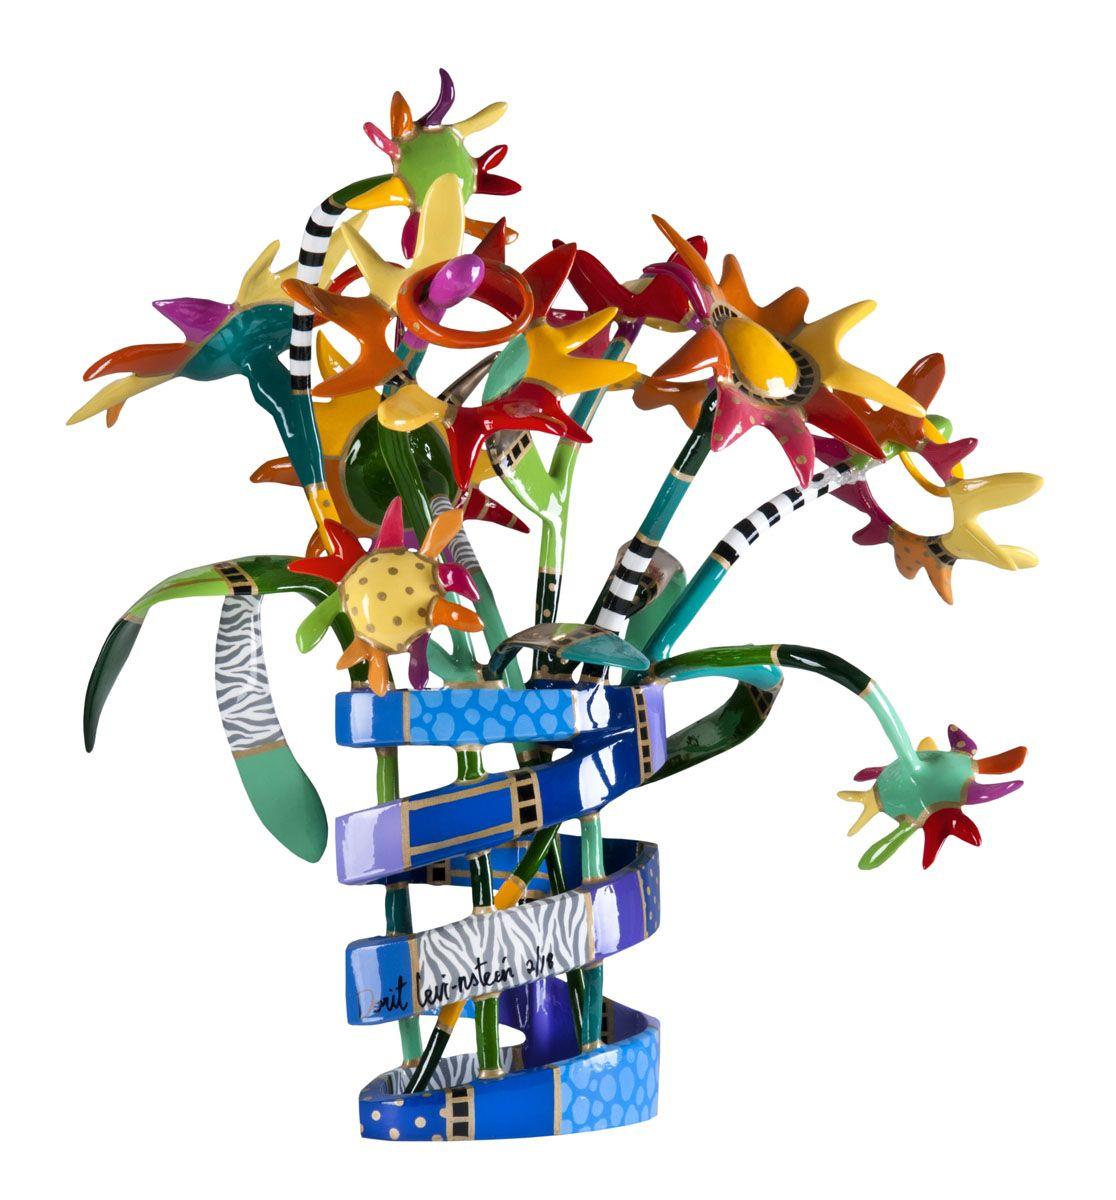 Dorit Levi-nstein Sun flowers | Fine art gallery, Art, Fine art